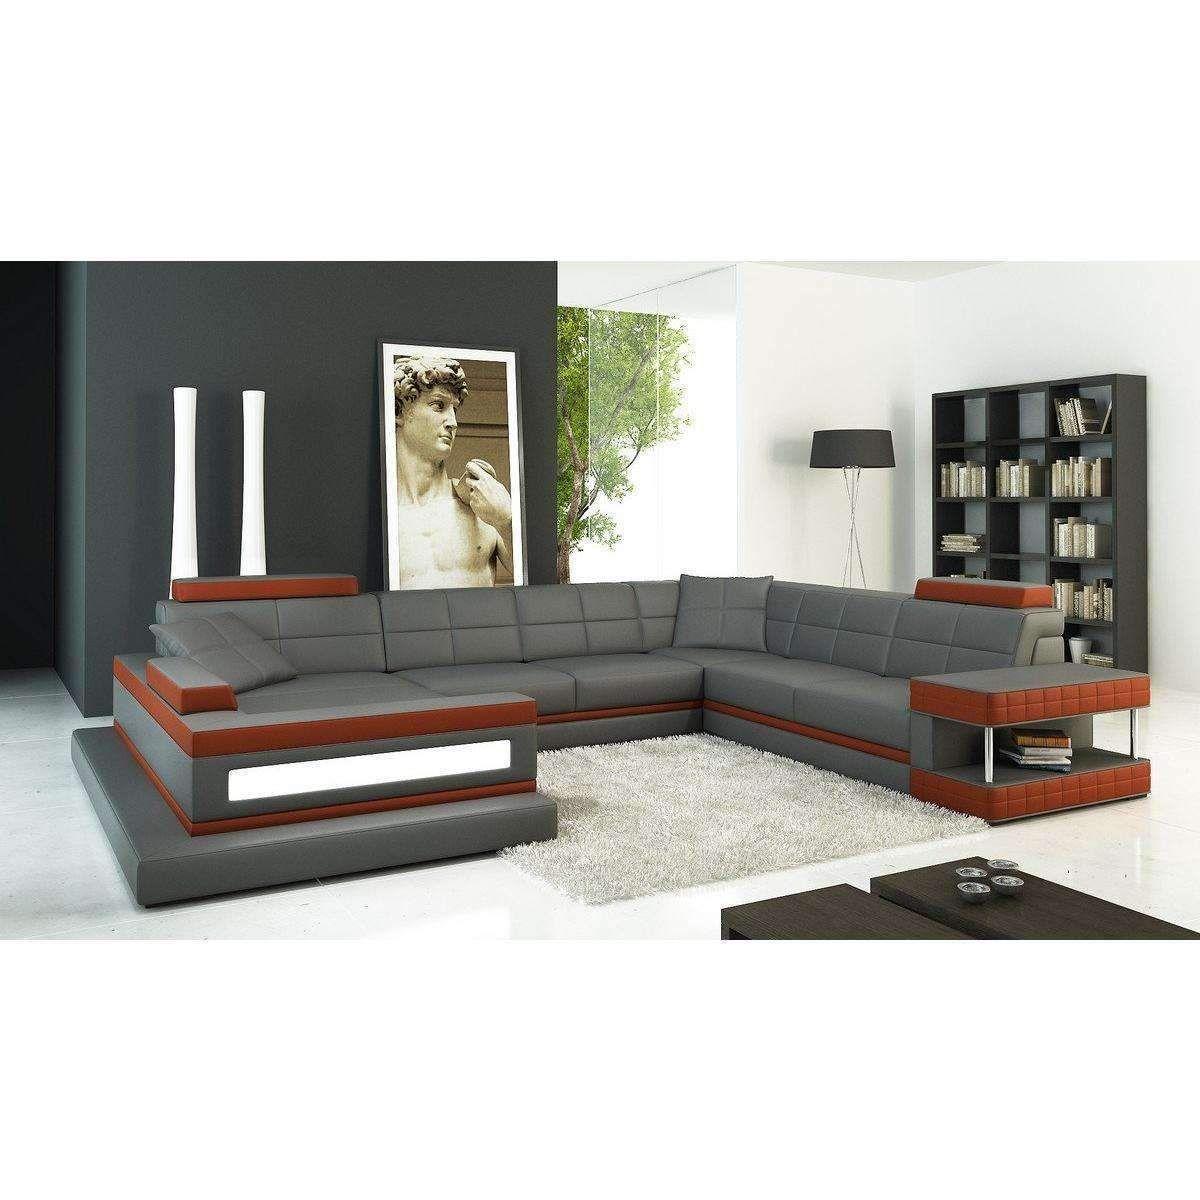 Divani Casa 5079 Grey and Dark Orange Bonded Leather Sectional Sofa